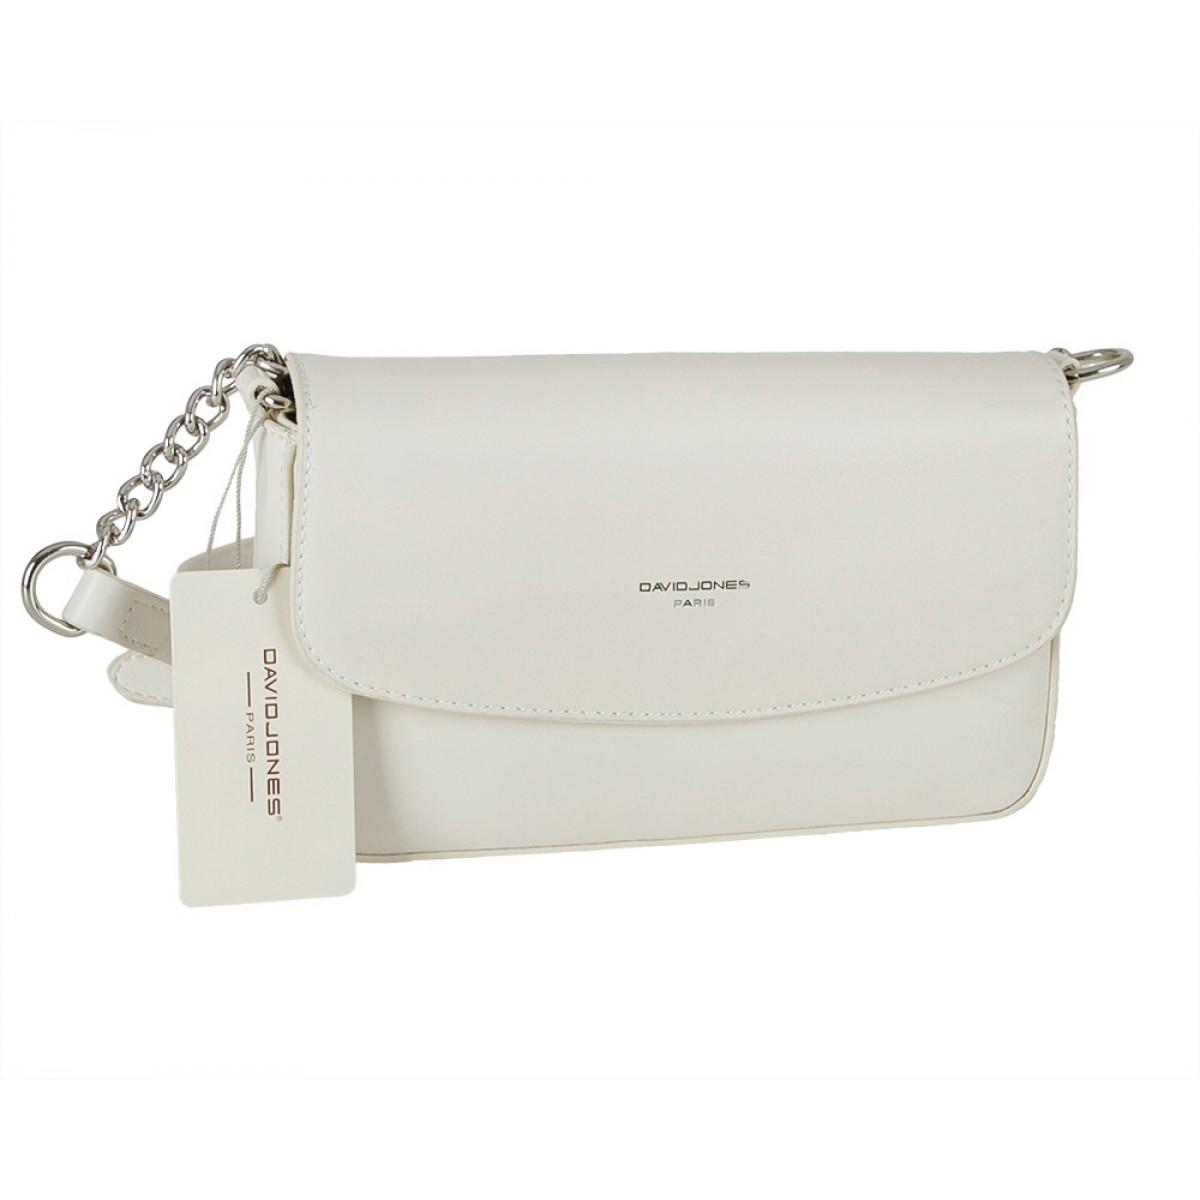 Жіноча сумка David Jones CM5635 CREAMY WHITE